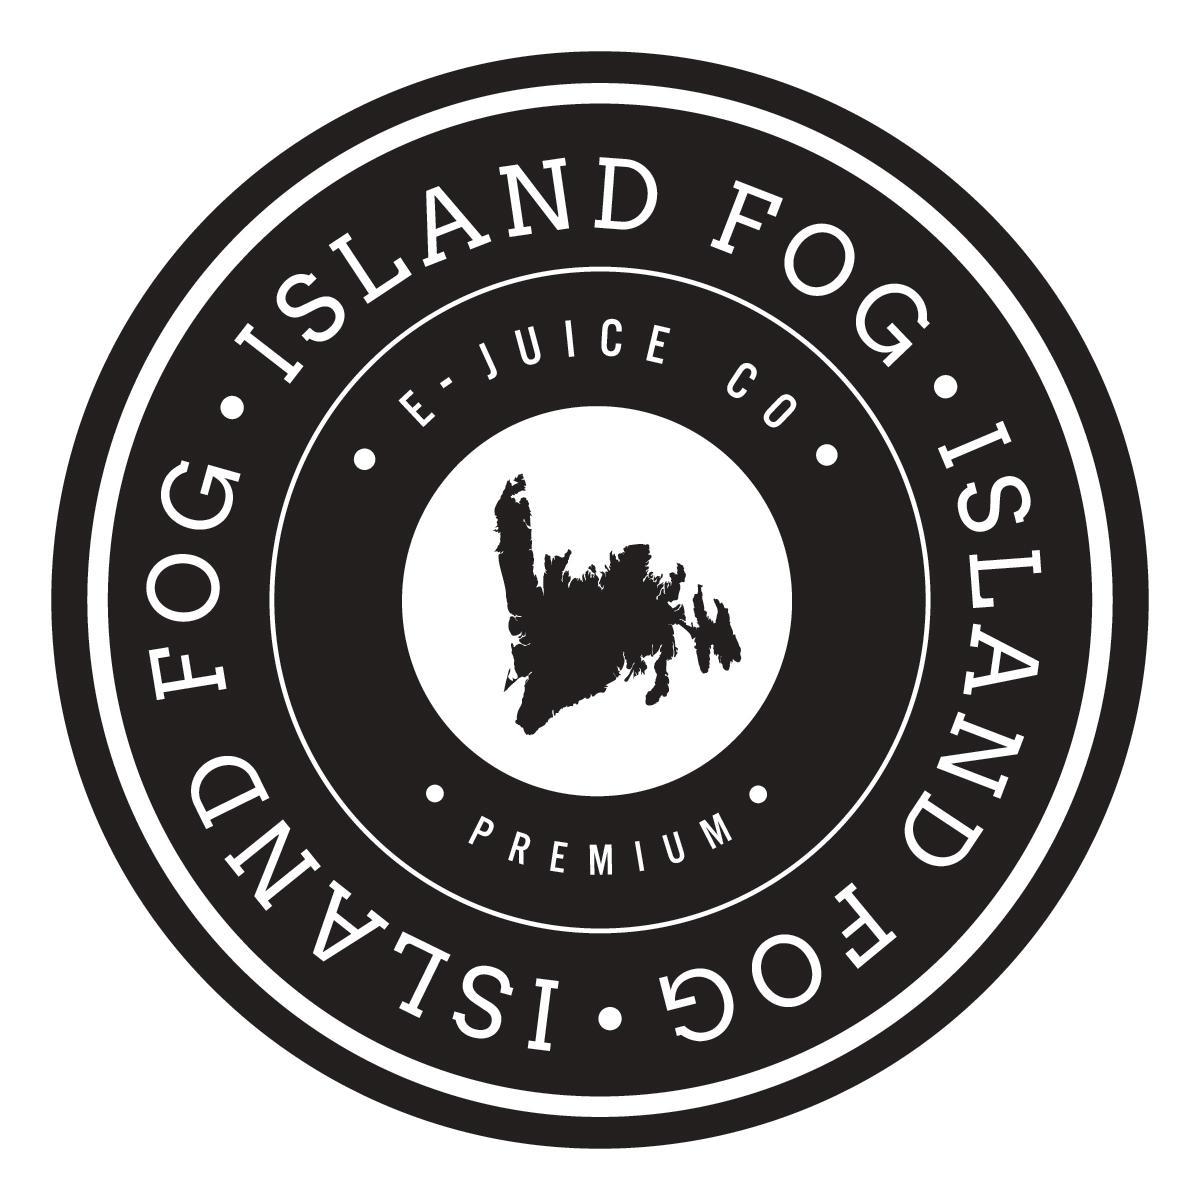 East Coast Distribution - VapeCity in St John's: ECD distributes Island Fog premium ejuice.